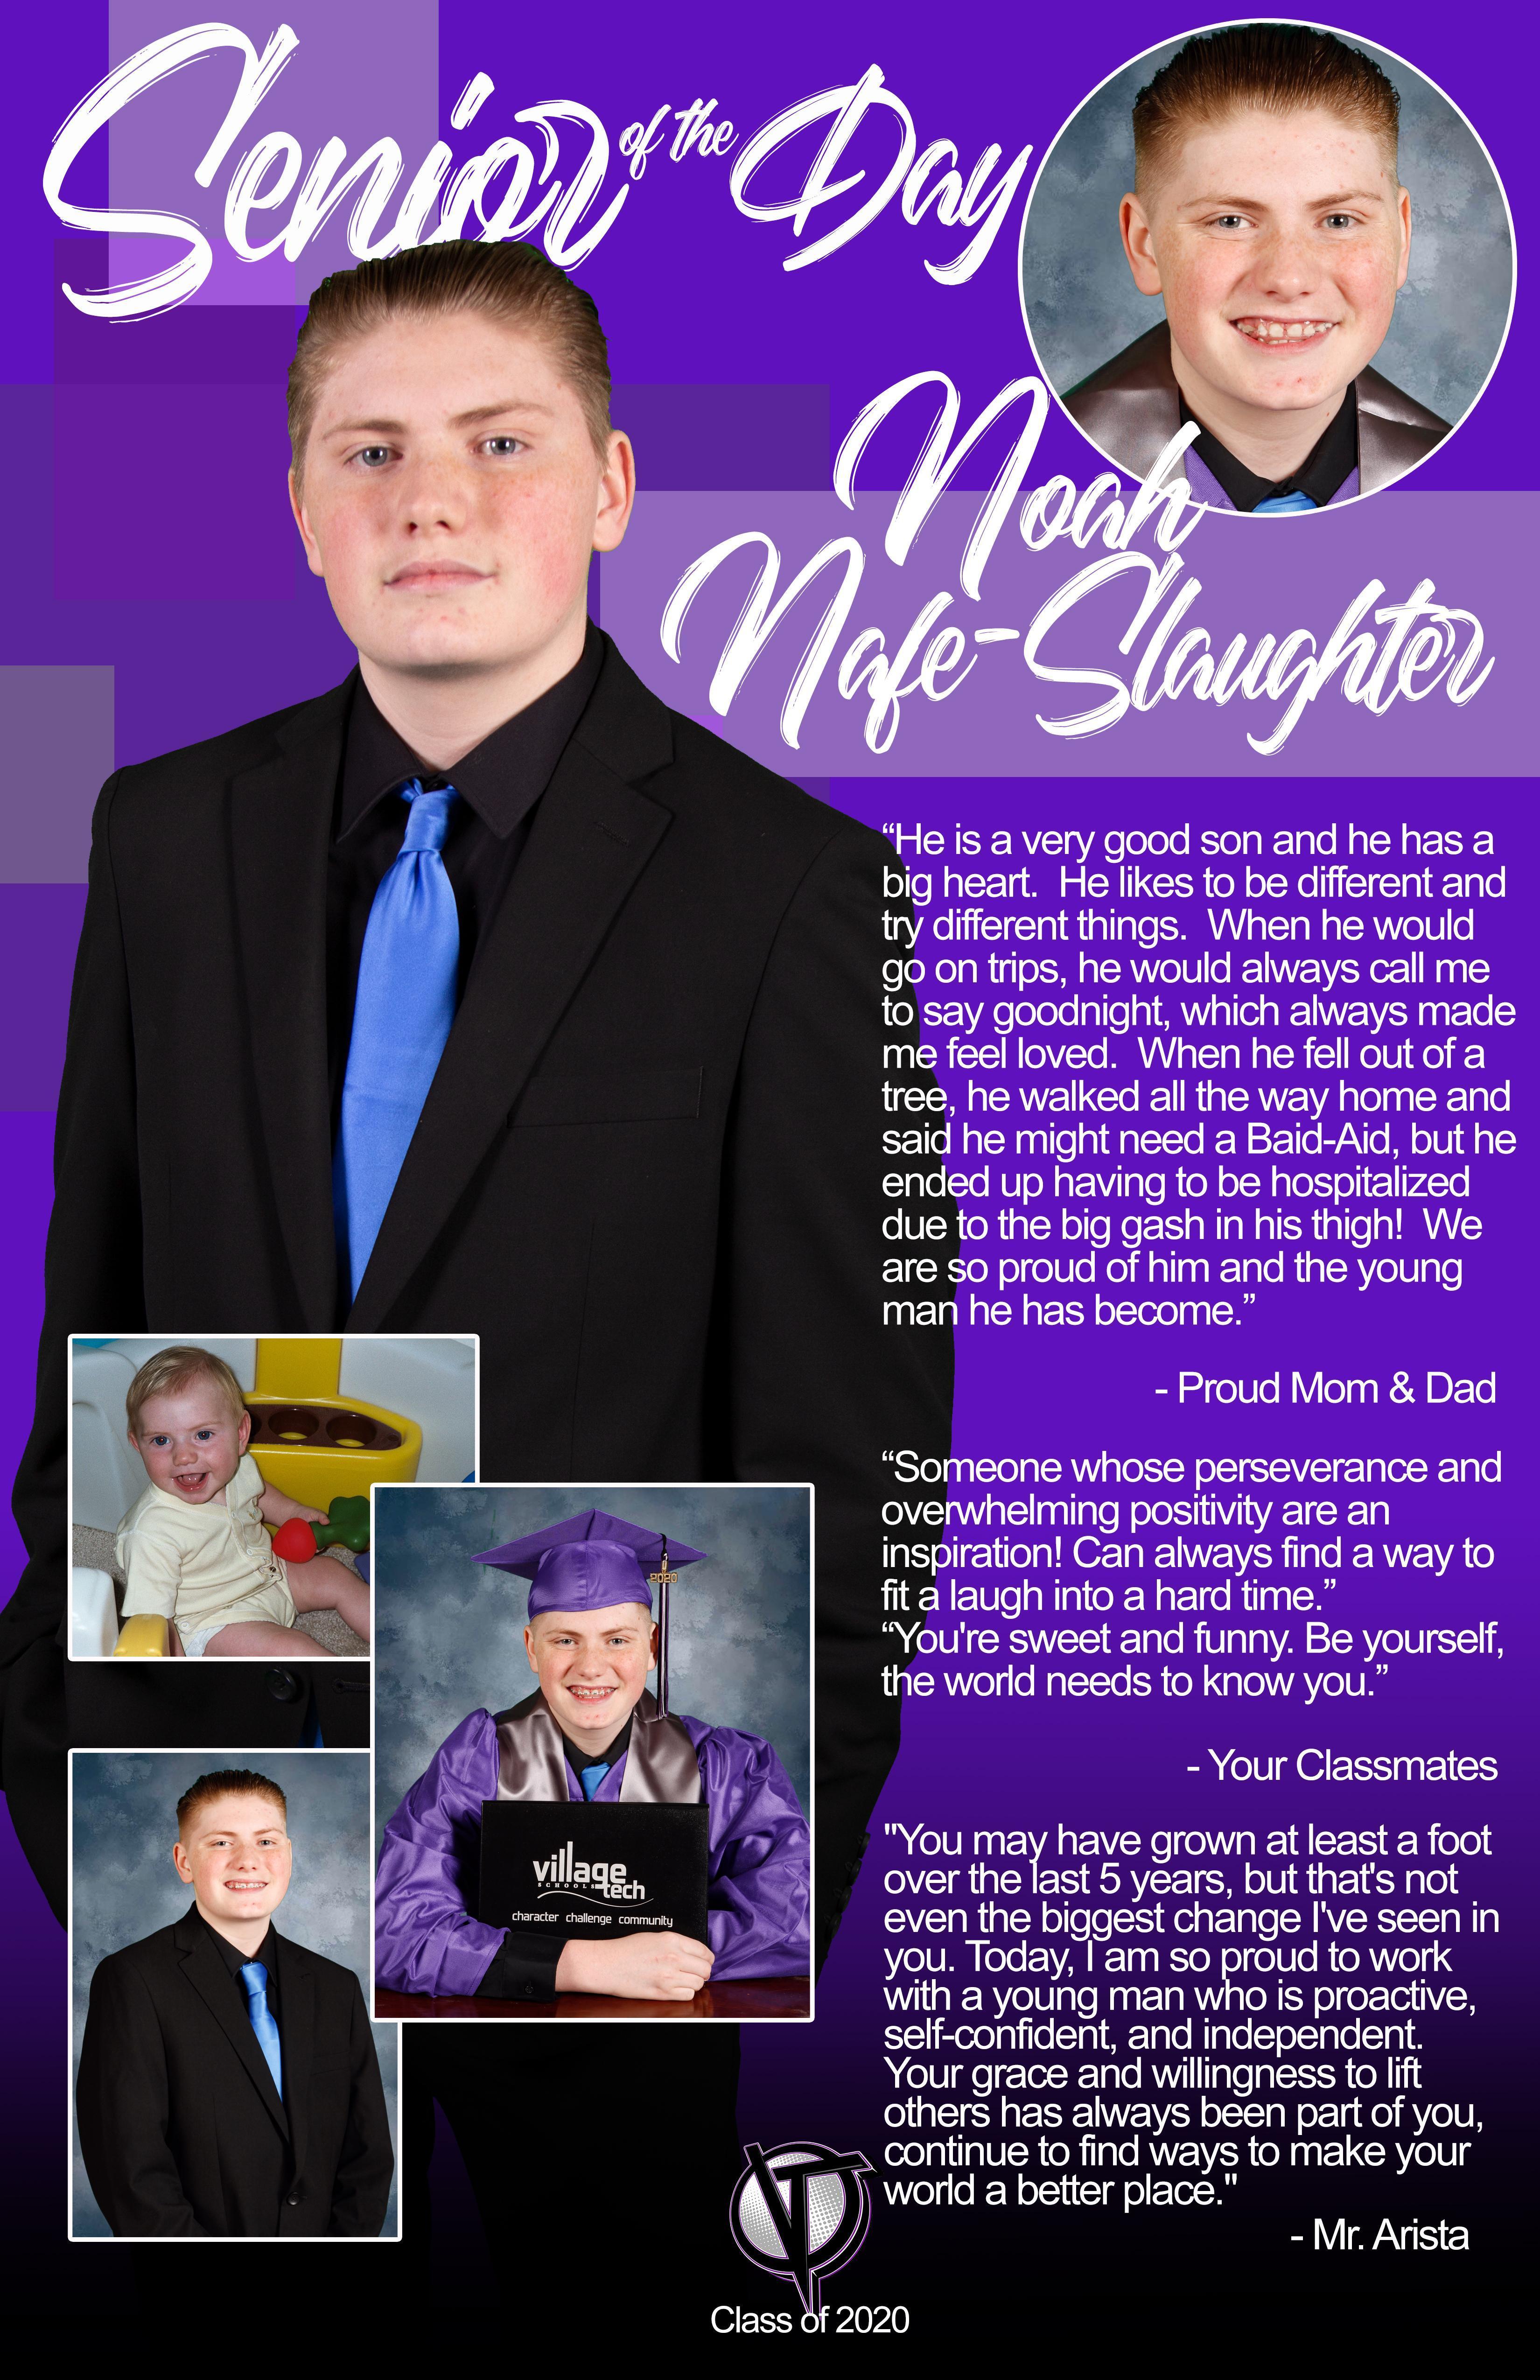 Noah Slaughter